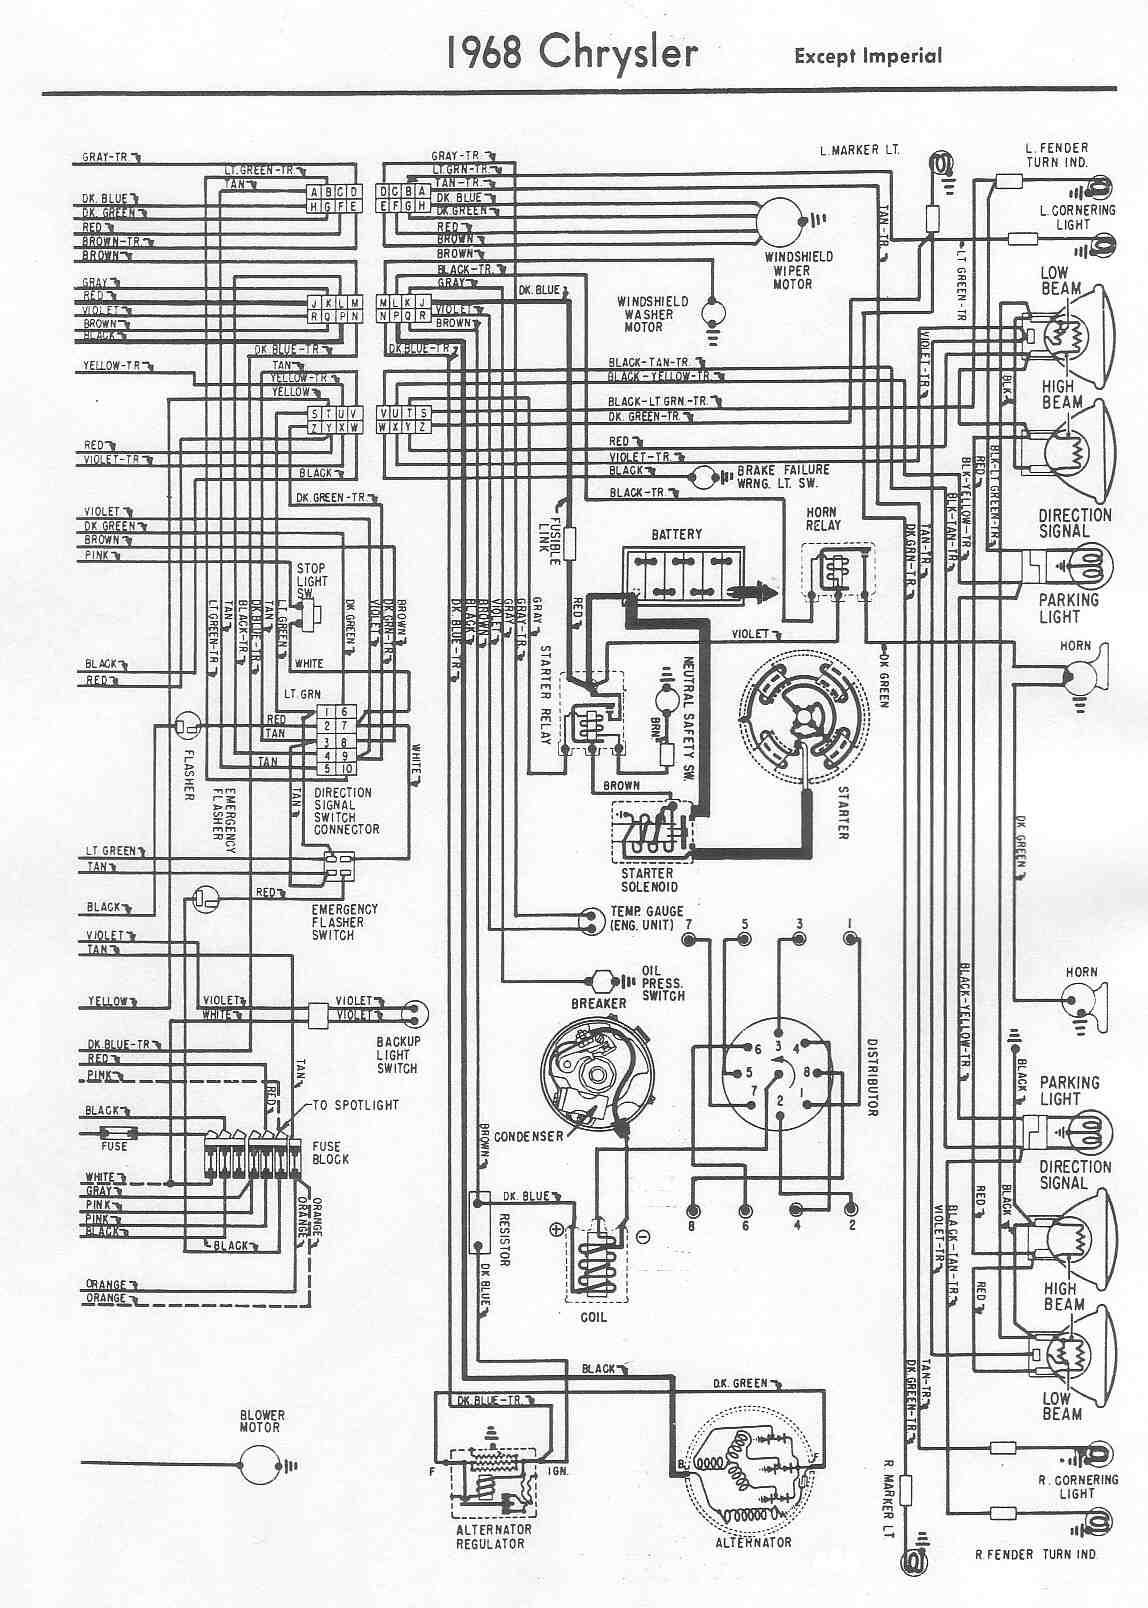 medium resolution of 1965 dodge coronet wiring diagram wiring diagram third level rh 10 12 12 jacobwinterstein com 1970